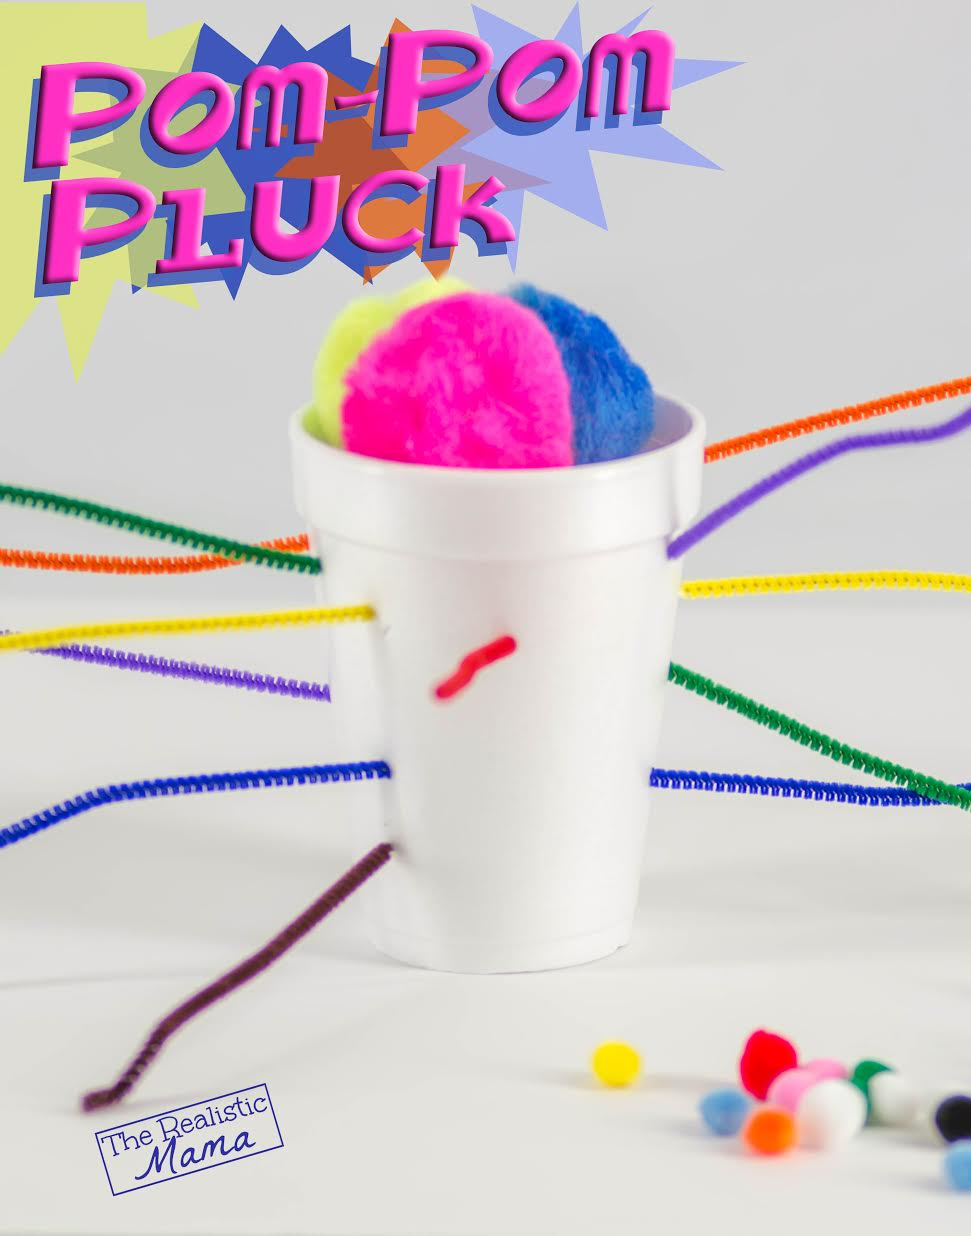 987af7ccfbd Pom-pom Pluck Game - The Realistic Mama